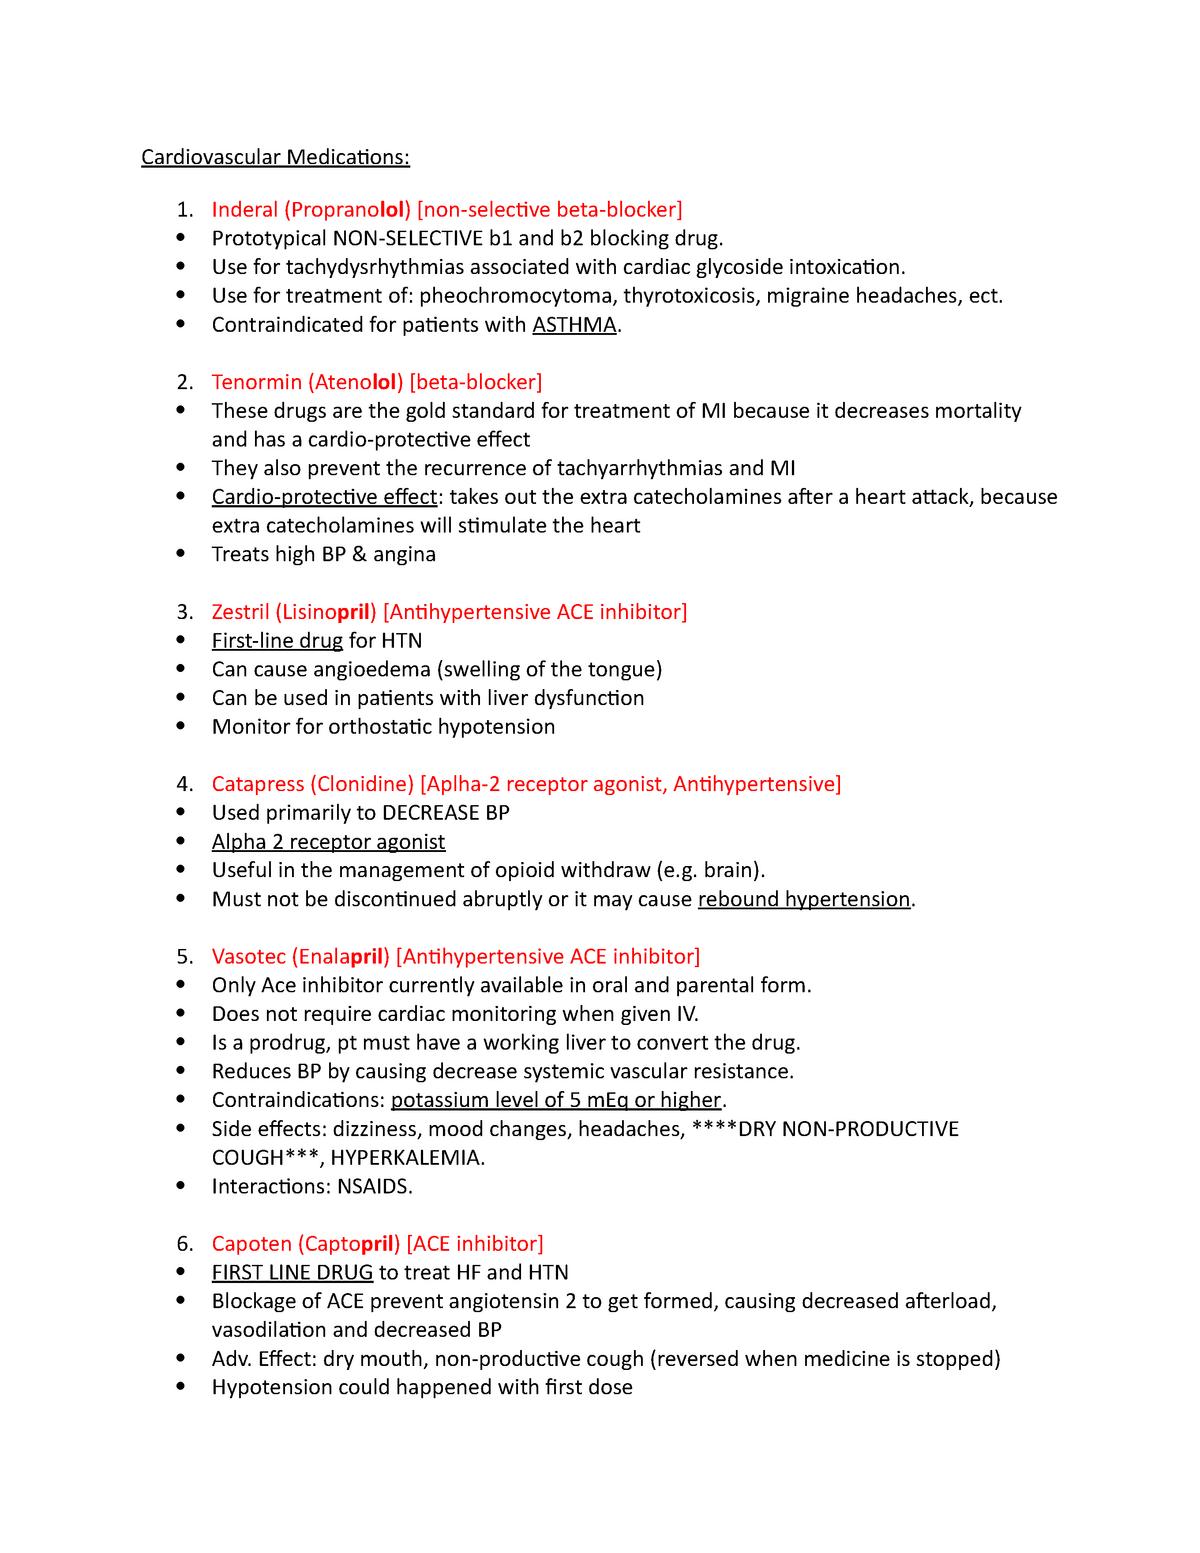 Drug Descriptions - pharmacology 2 final exam notes - NUR